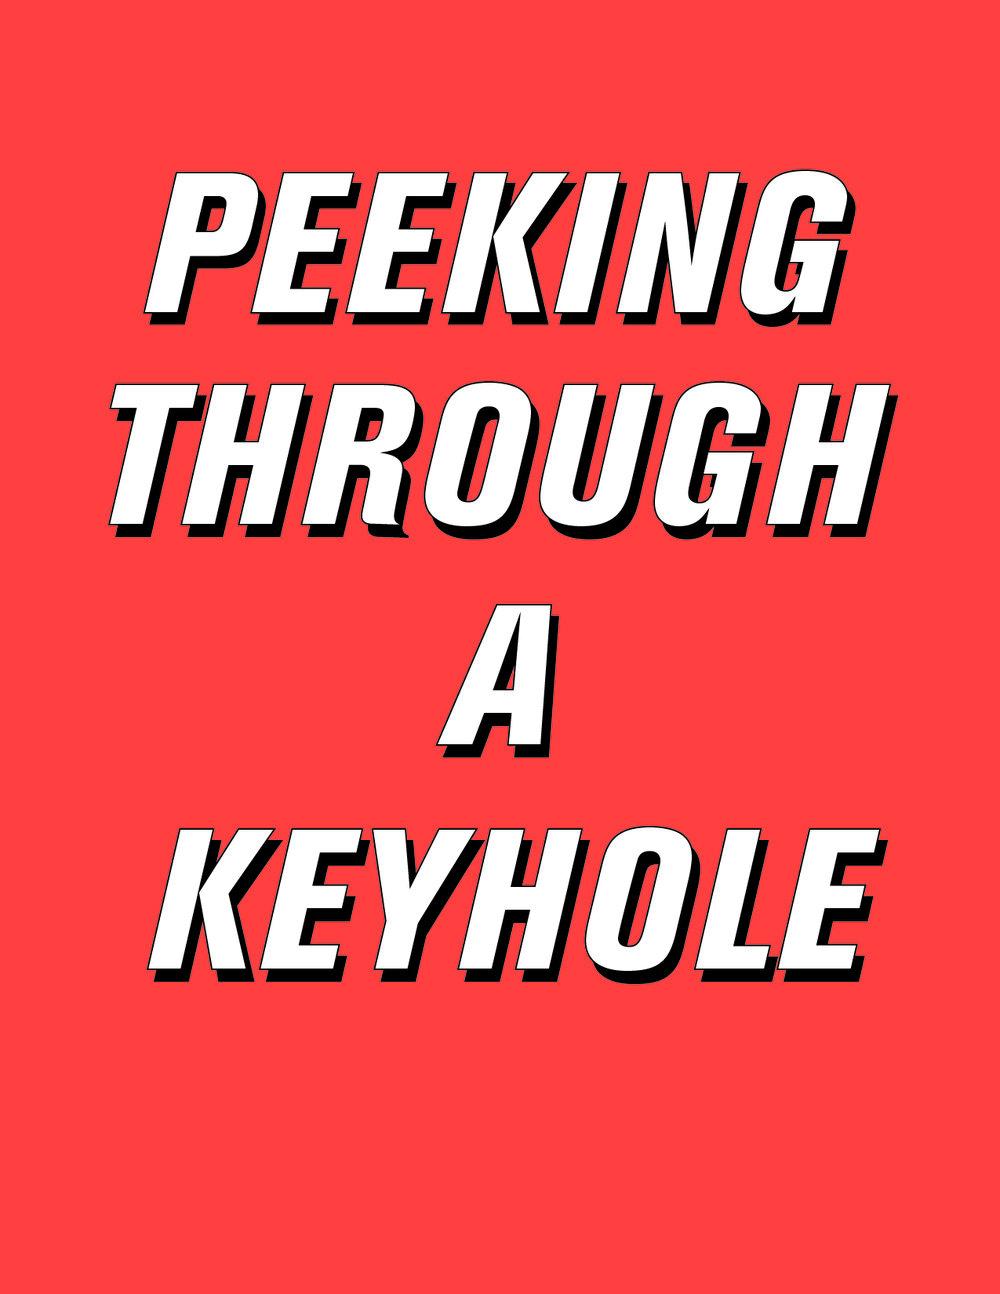 KEYHOLE-01.jpg